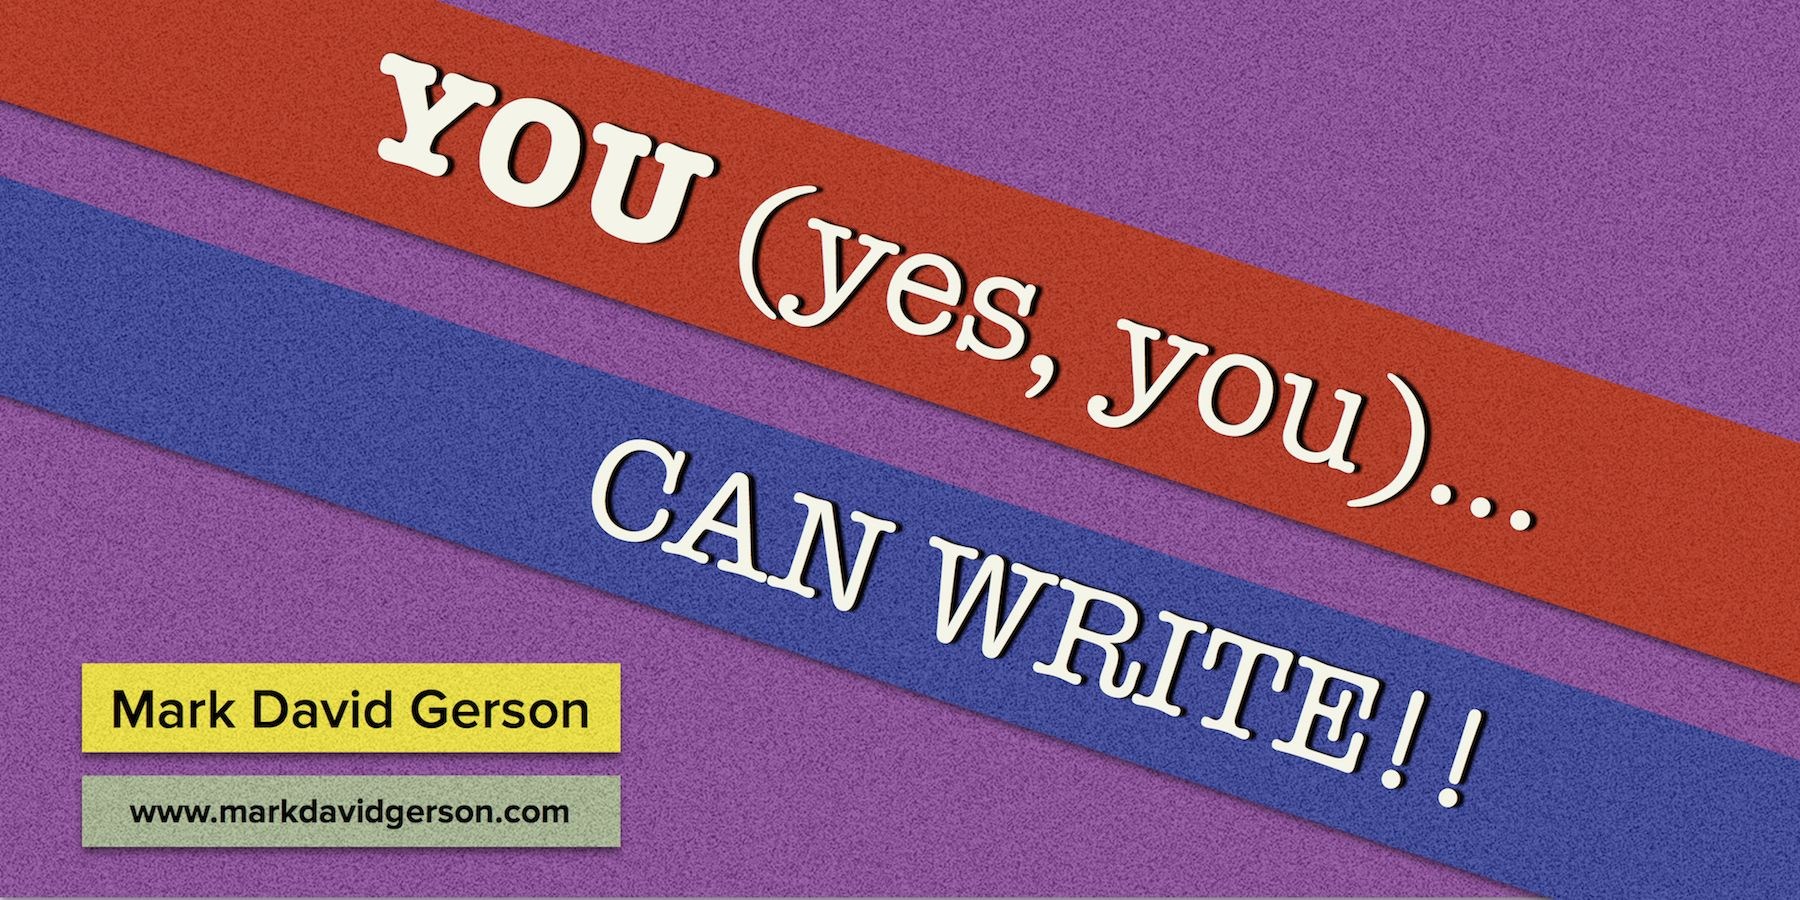 Pin on Writing/Creativity Inspiration